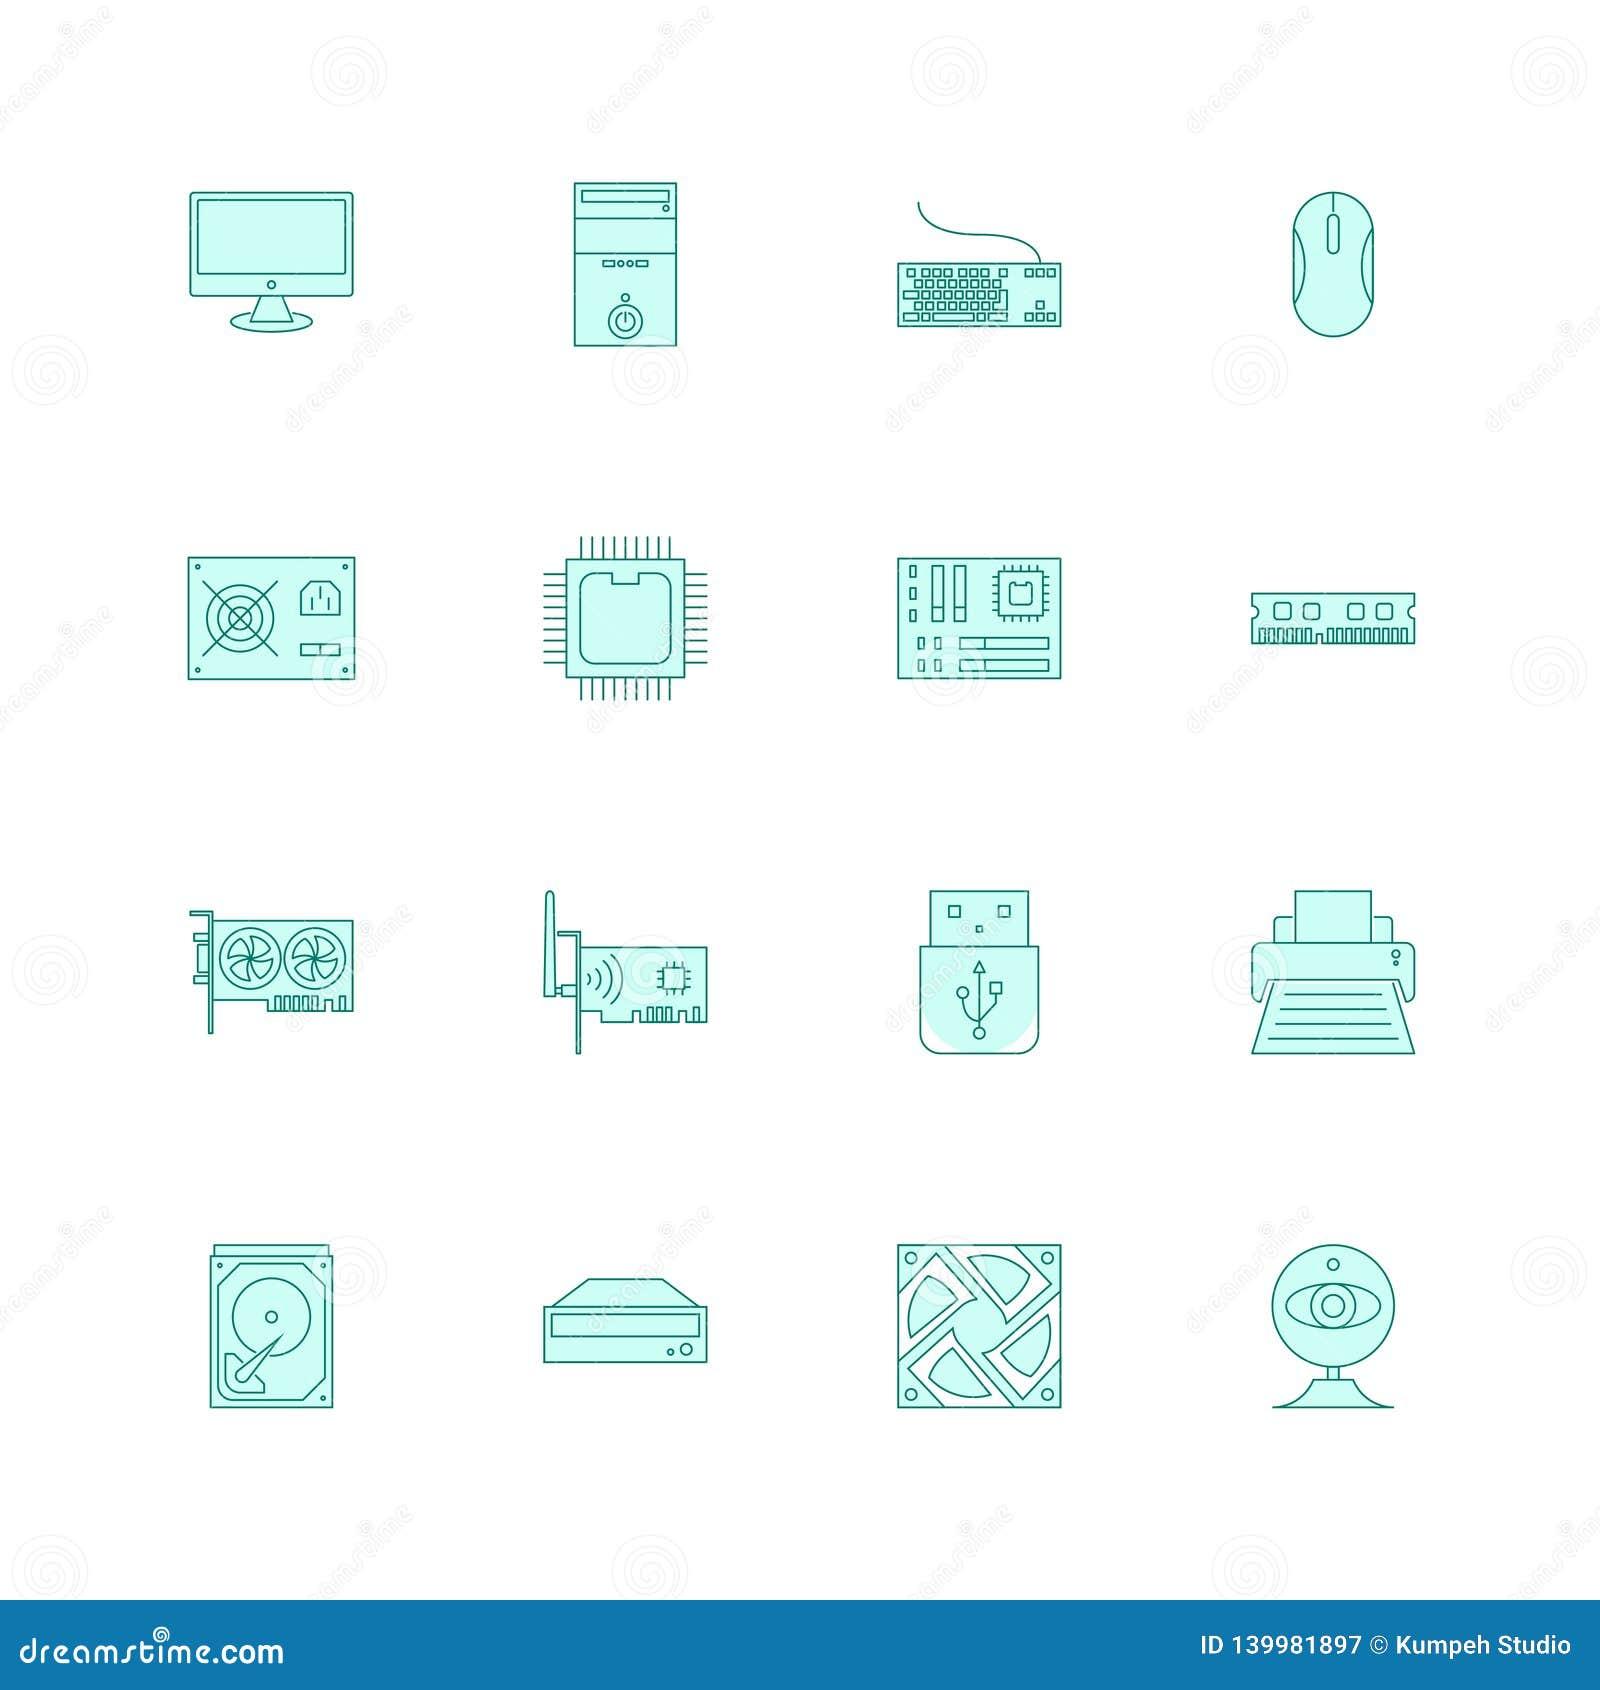 Computer hardware icons set filled outline or line style vector illustration